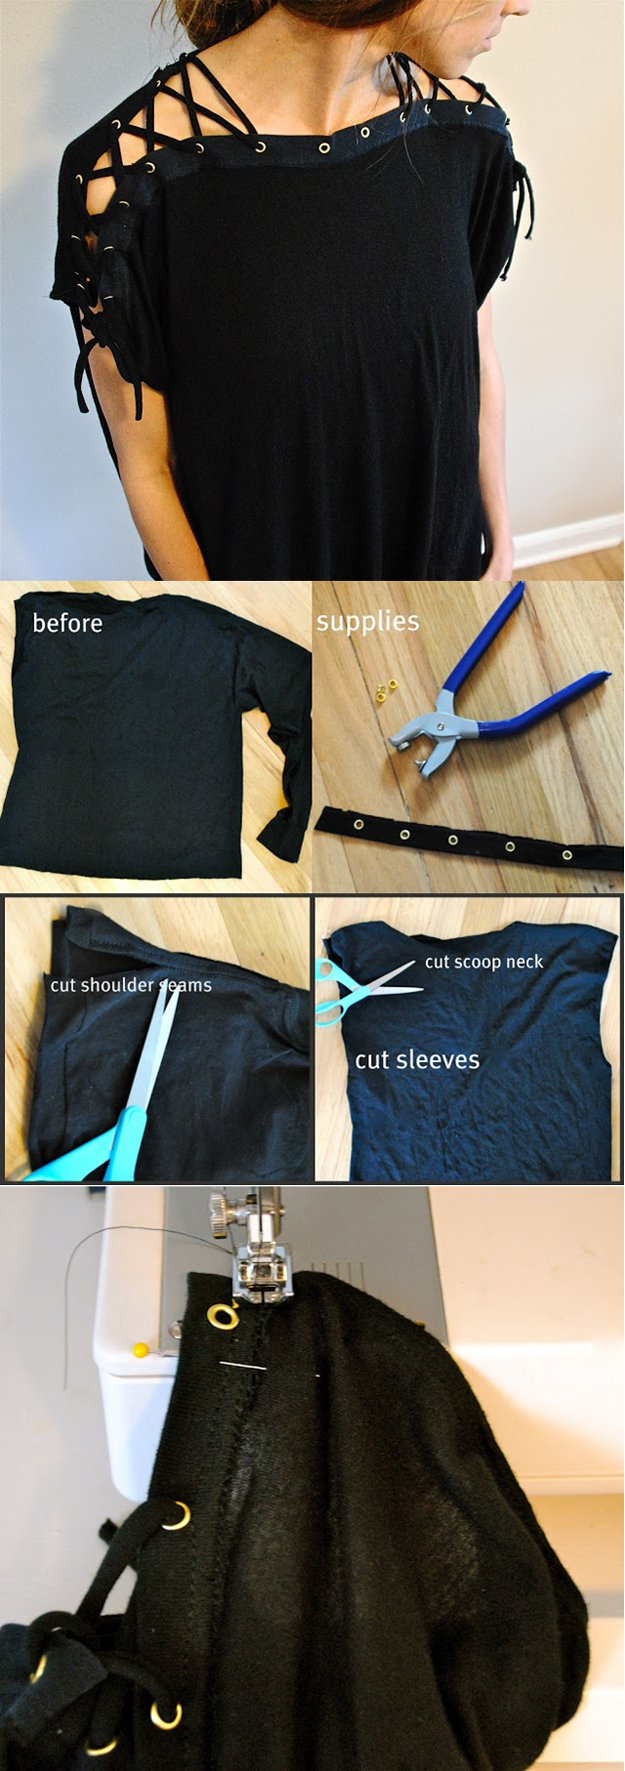 Hot Top Design Tutorial | diyready.com/diy-clothes-sewing-blouses-tutorial/